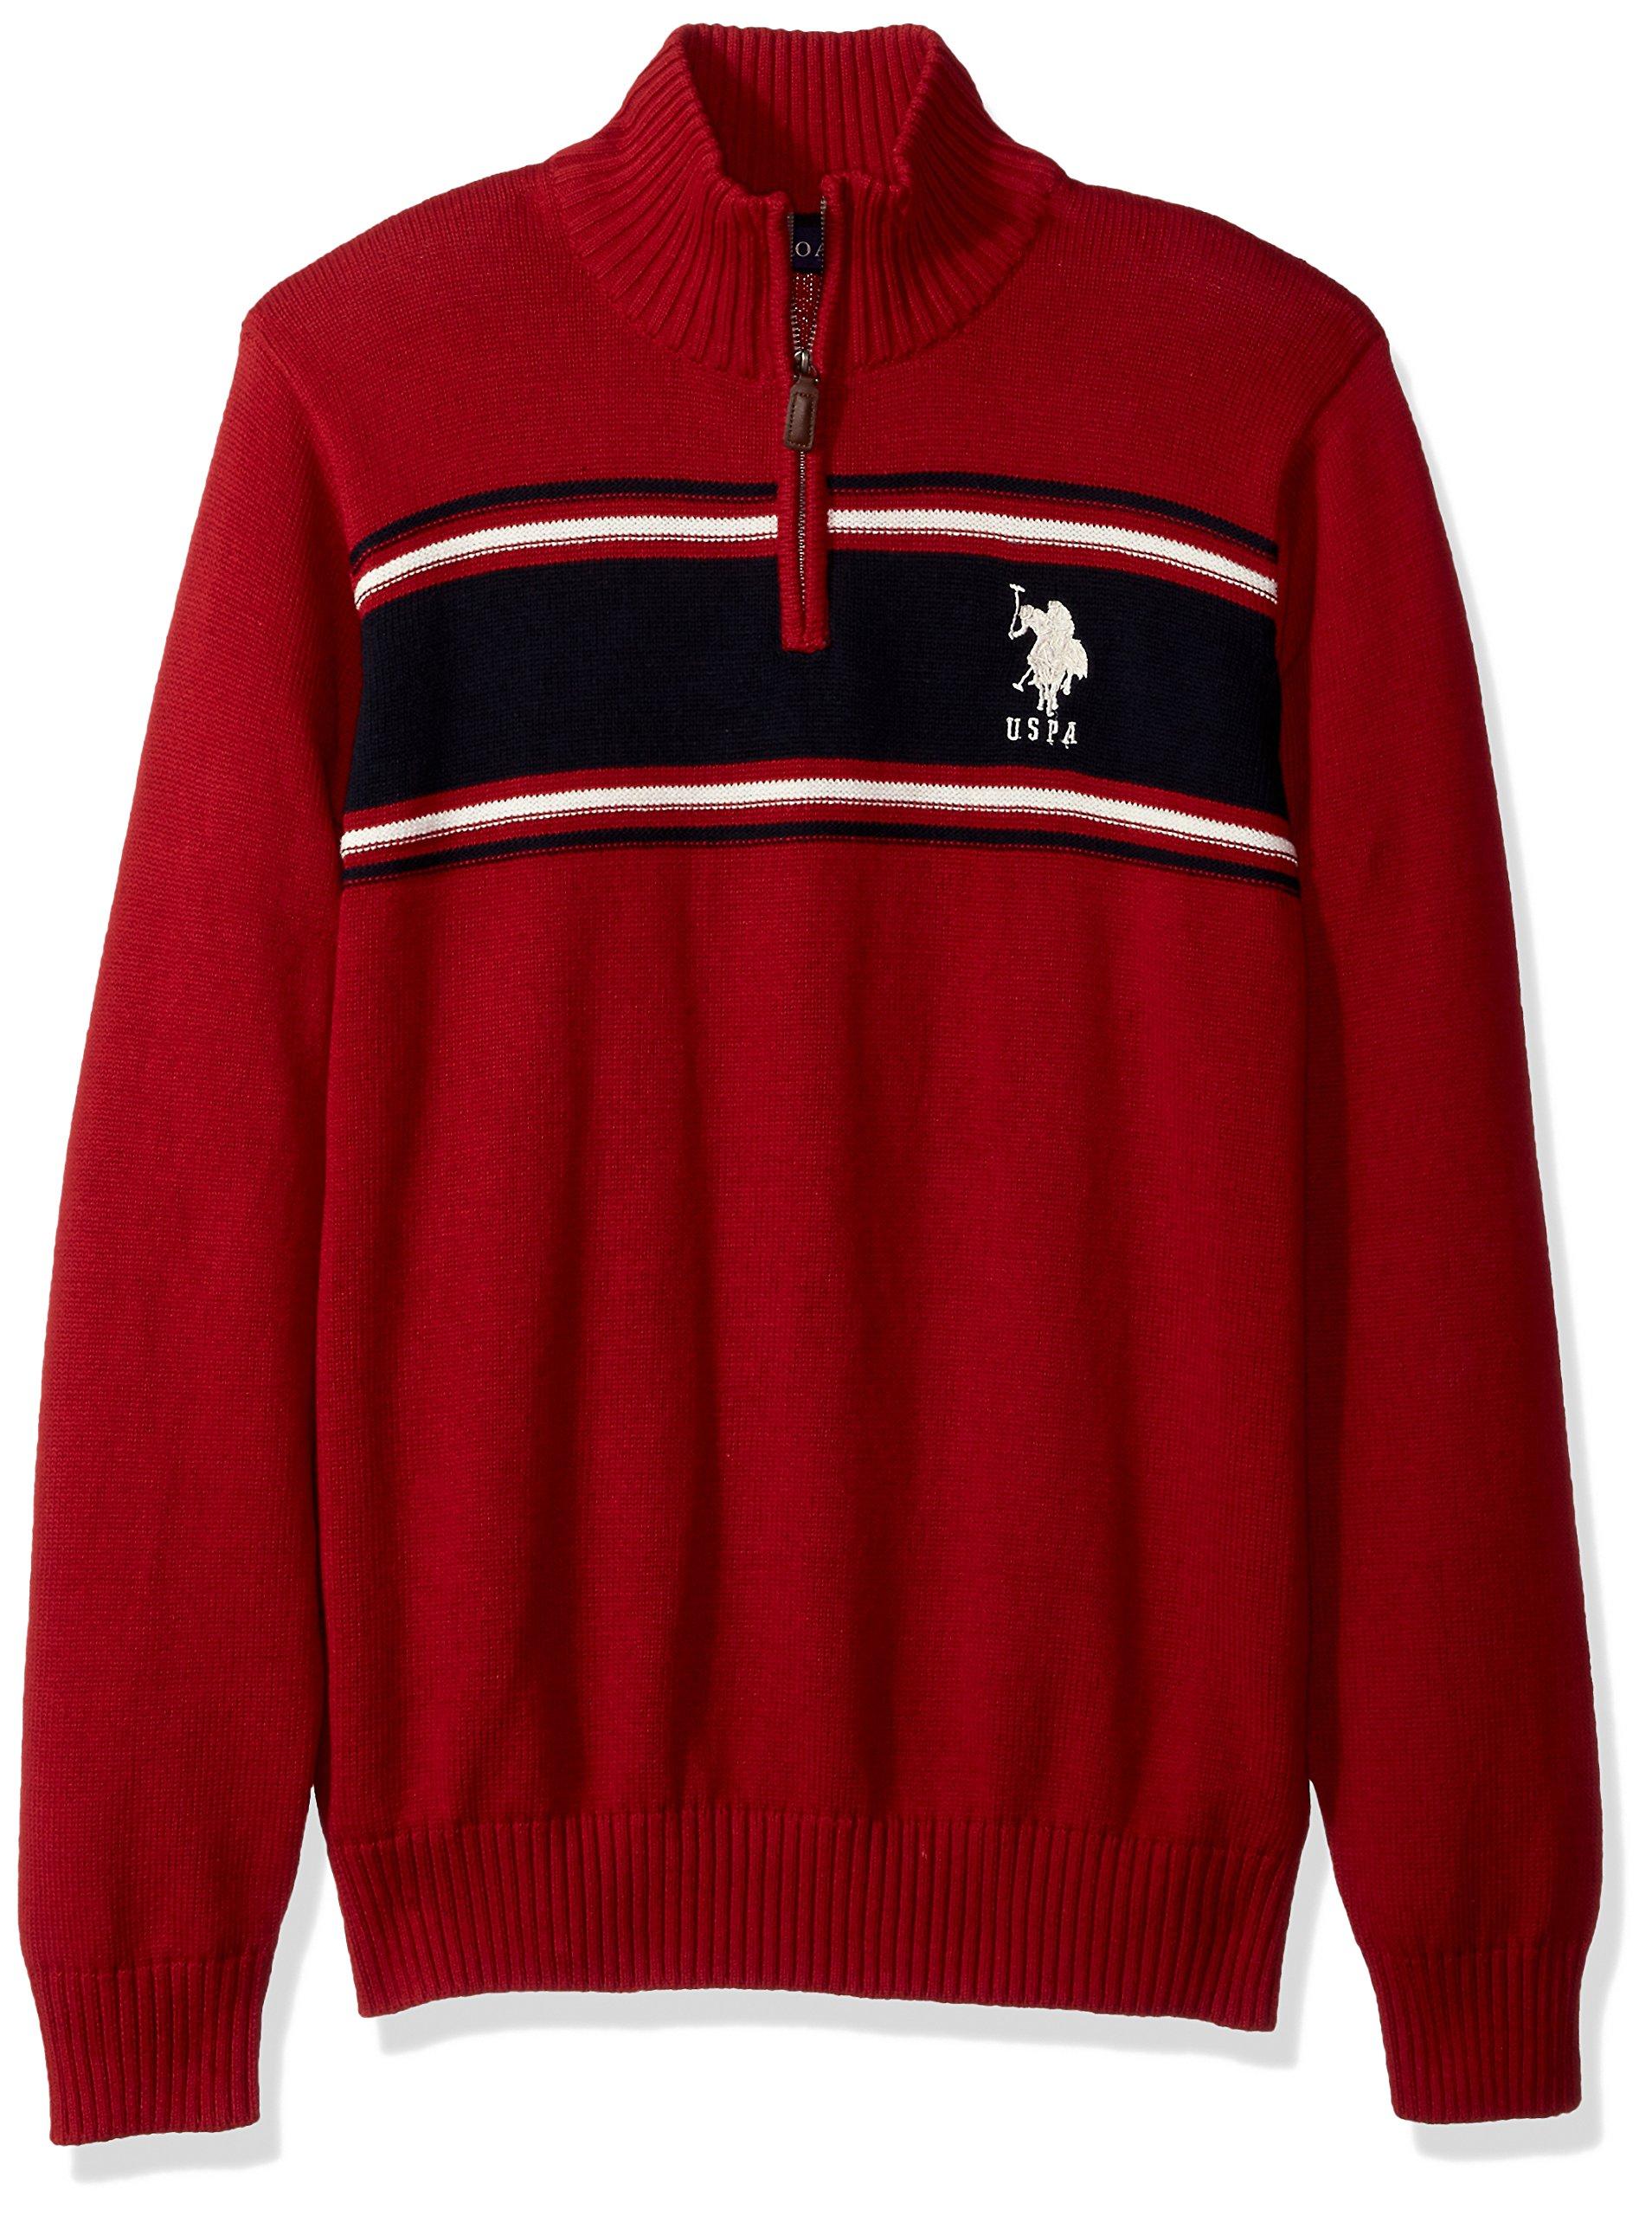 U.S. Polo Assn. Men's Chest Stripe 1/4 Zip Sweater, Apple Cinnamon, Medium by U.S. Polo Assn.